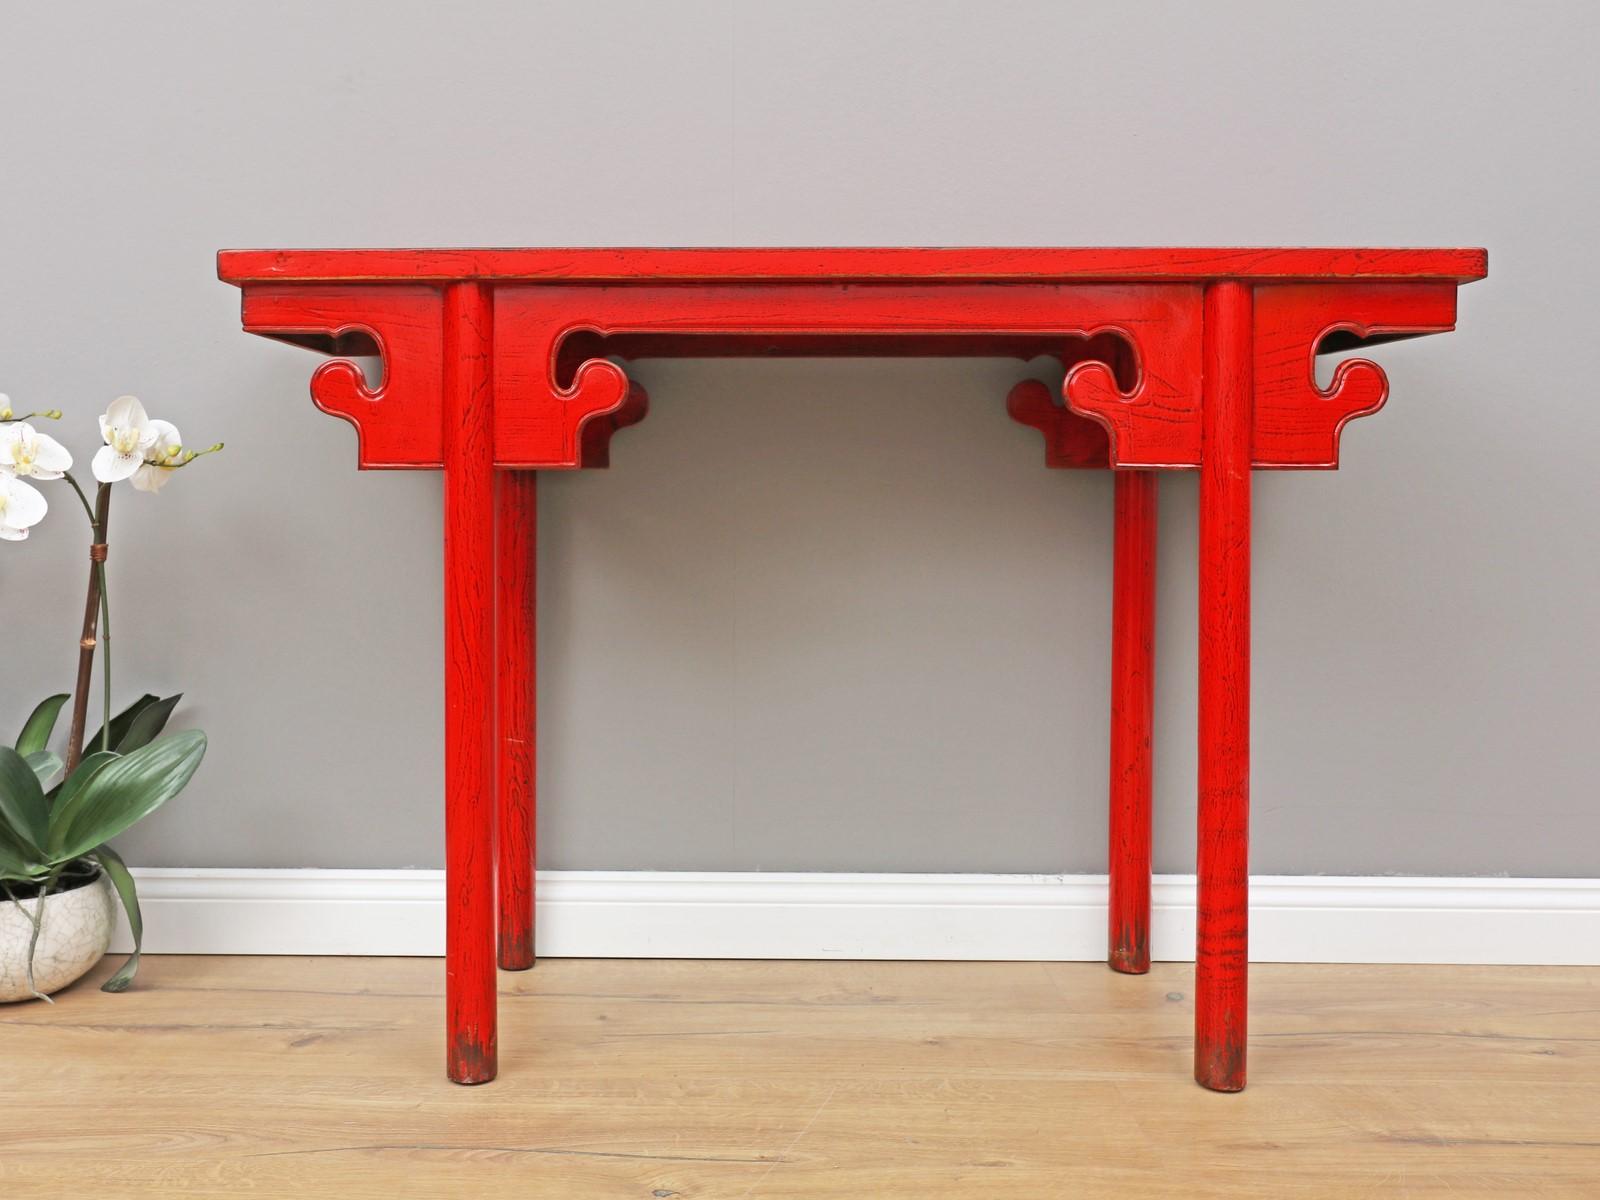 Tisch Couchtisch Sofatisch Opium Massivholz 120x50x70 DJ1678